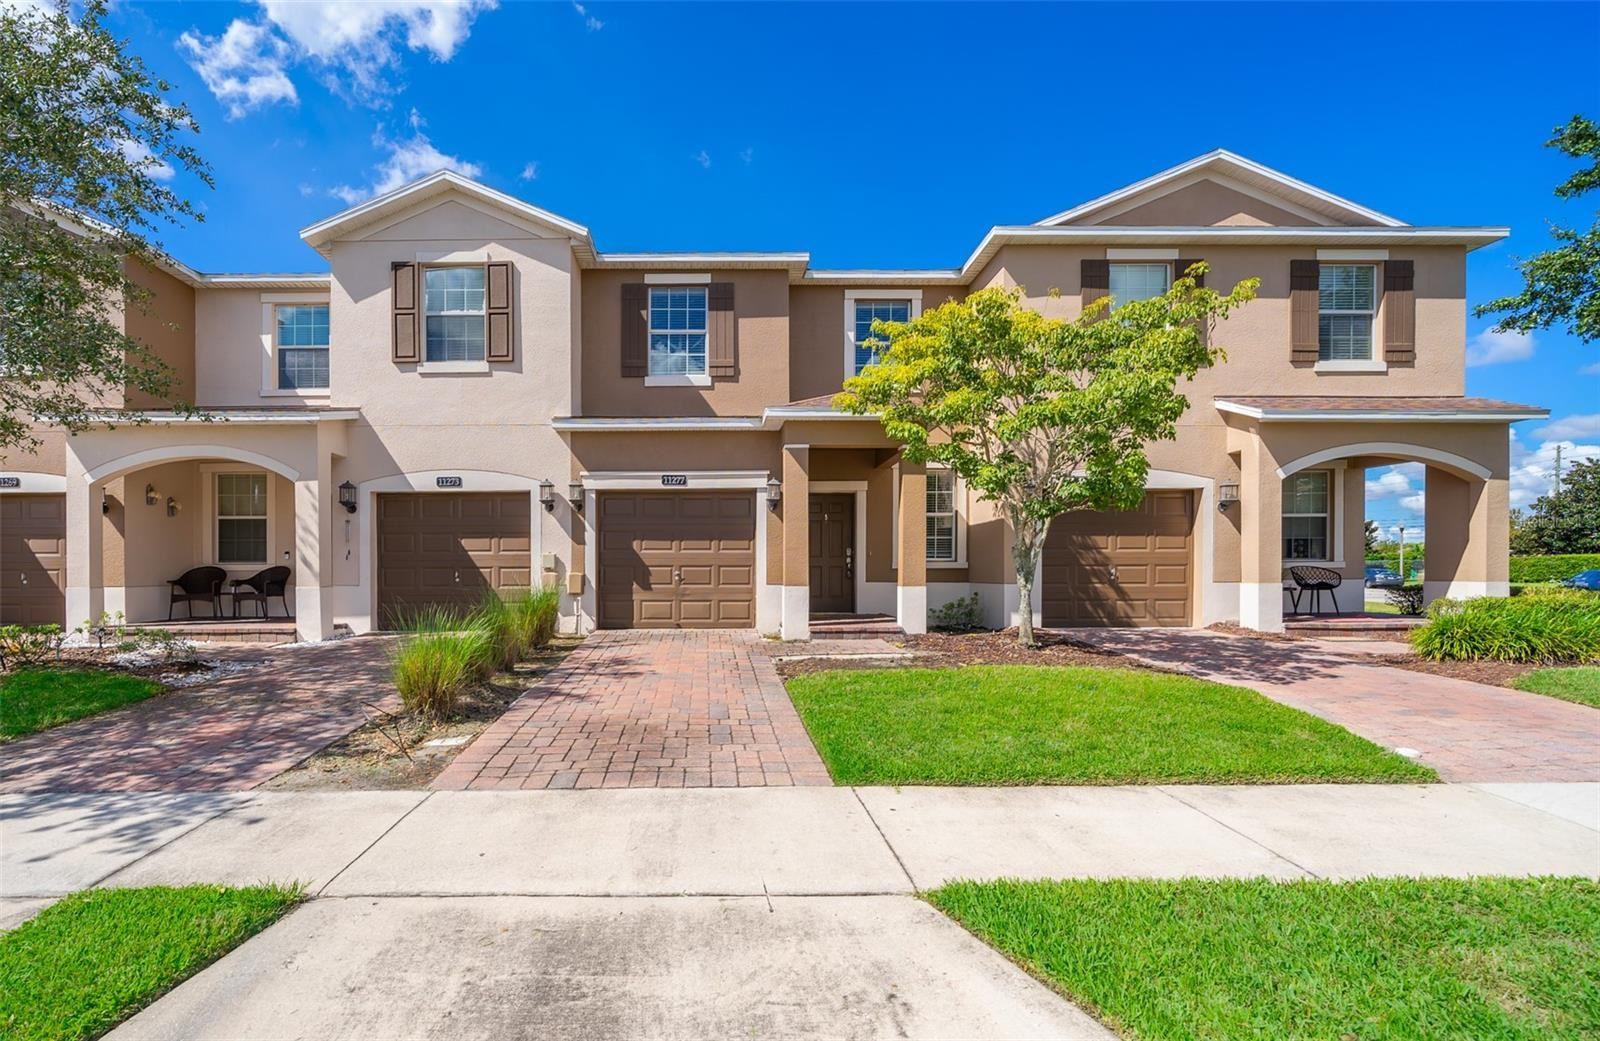 11277 SAVANNAH LANDING CIRCLE, Orlando, FL 32832 - #: S5056641